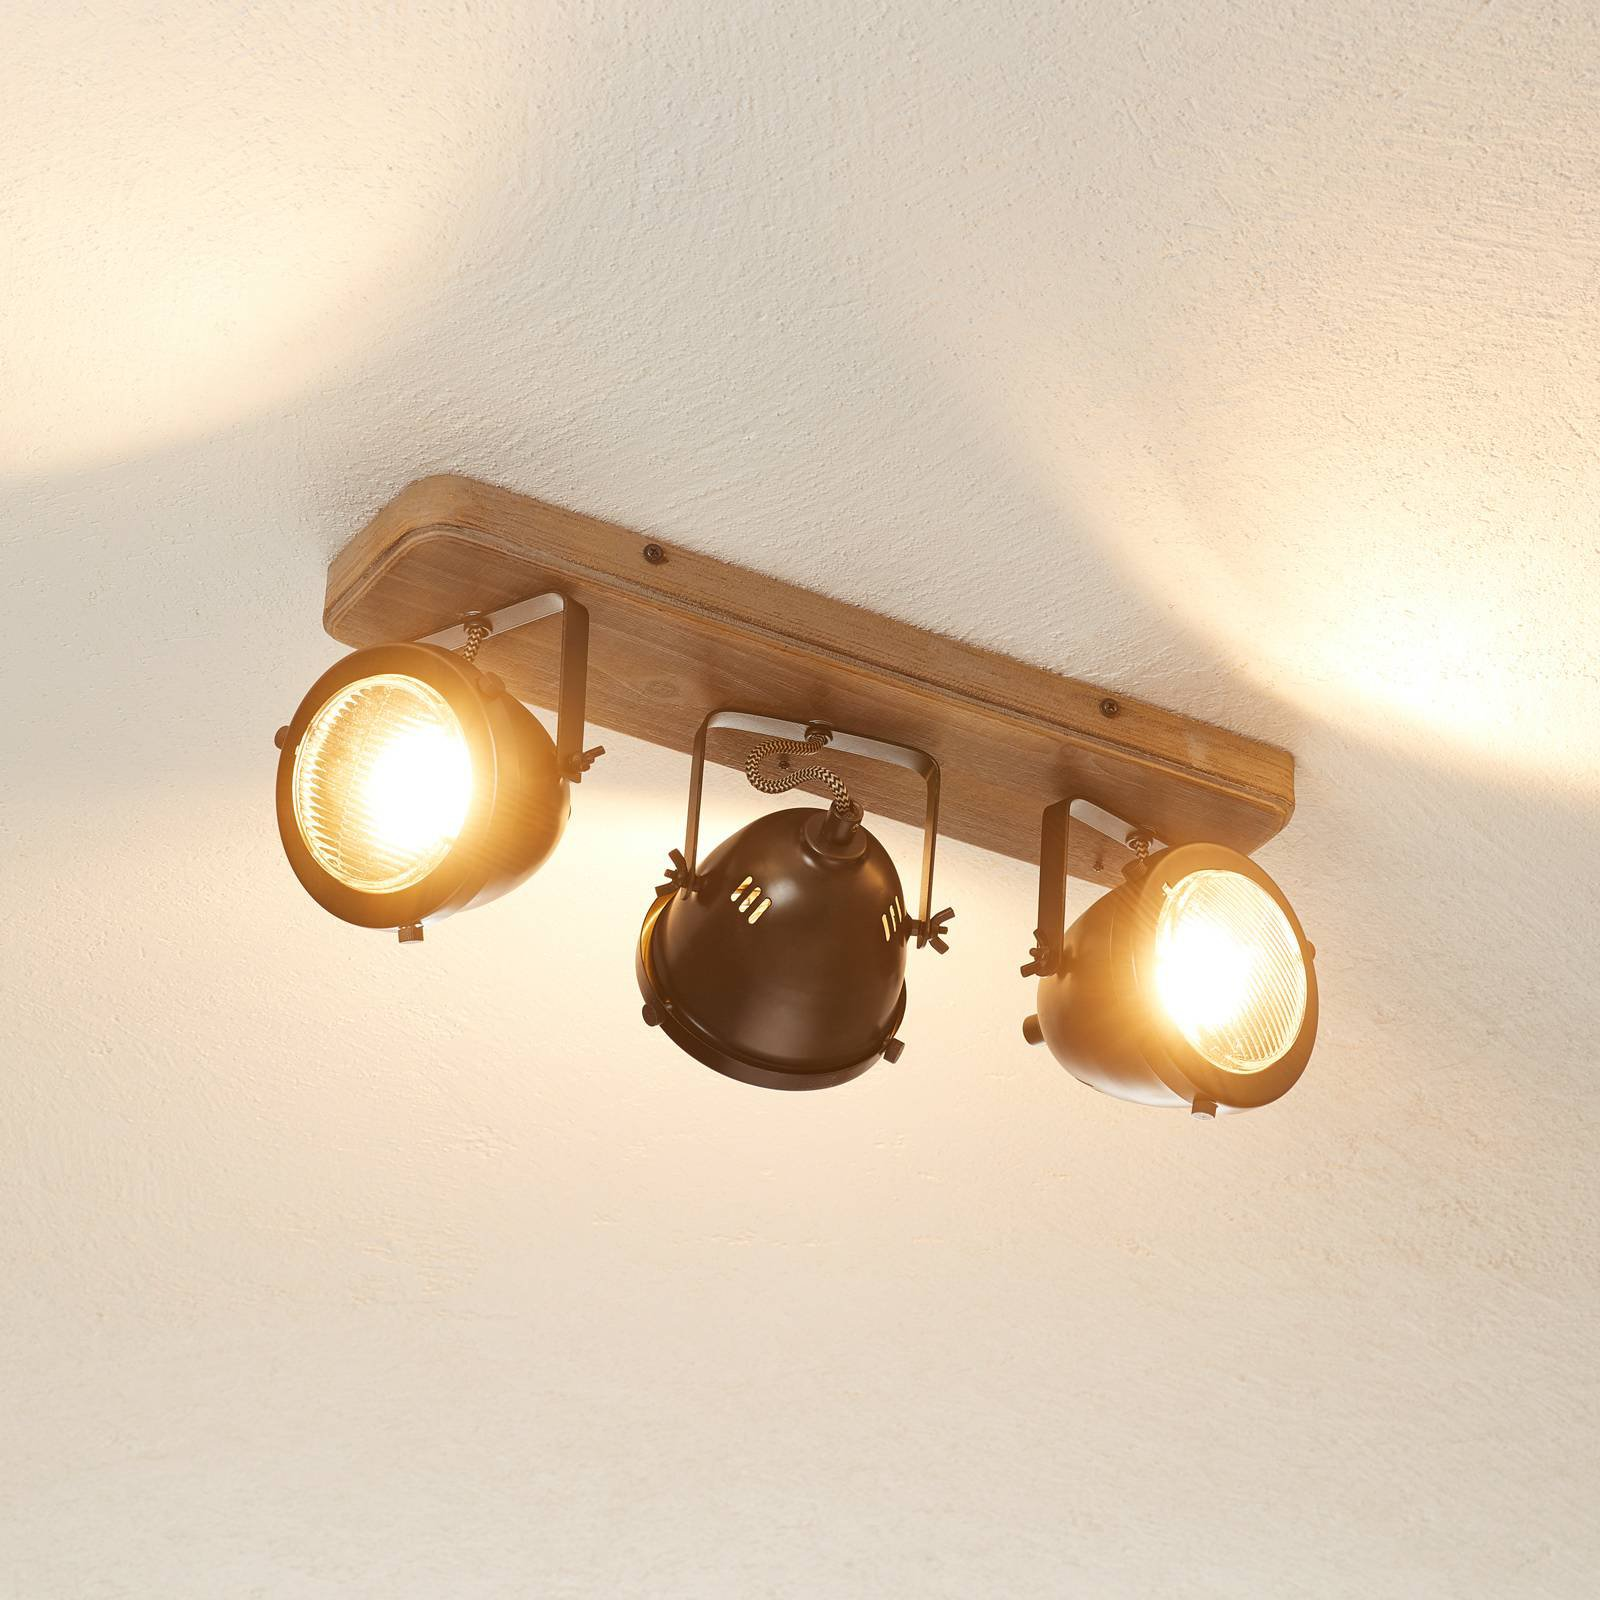 Taklampe Carmen Wood, industriell stil 3 lyskilder